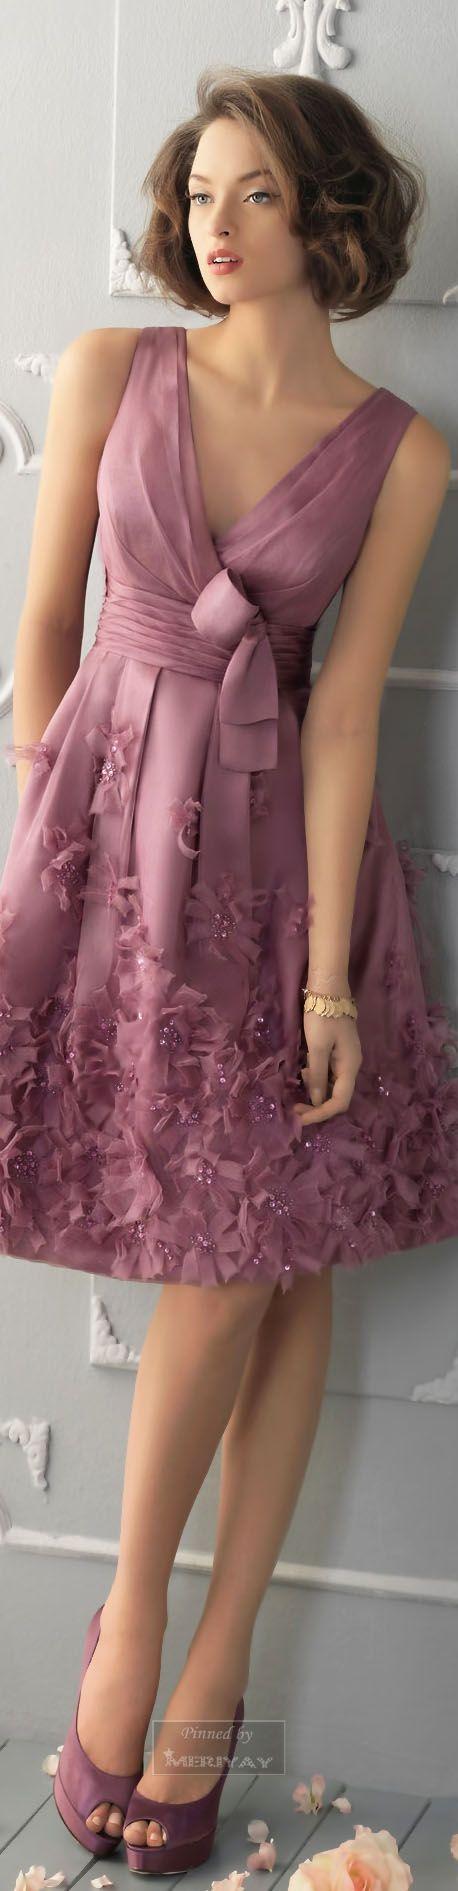 vestido fiesta en lila - Aire Barcelona.